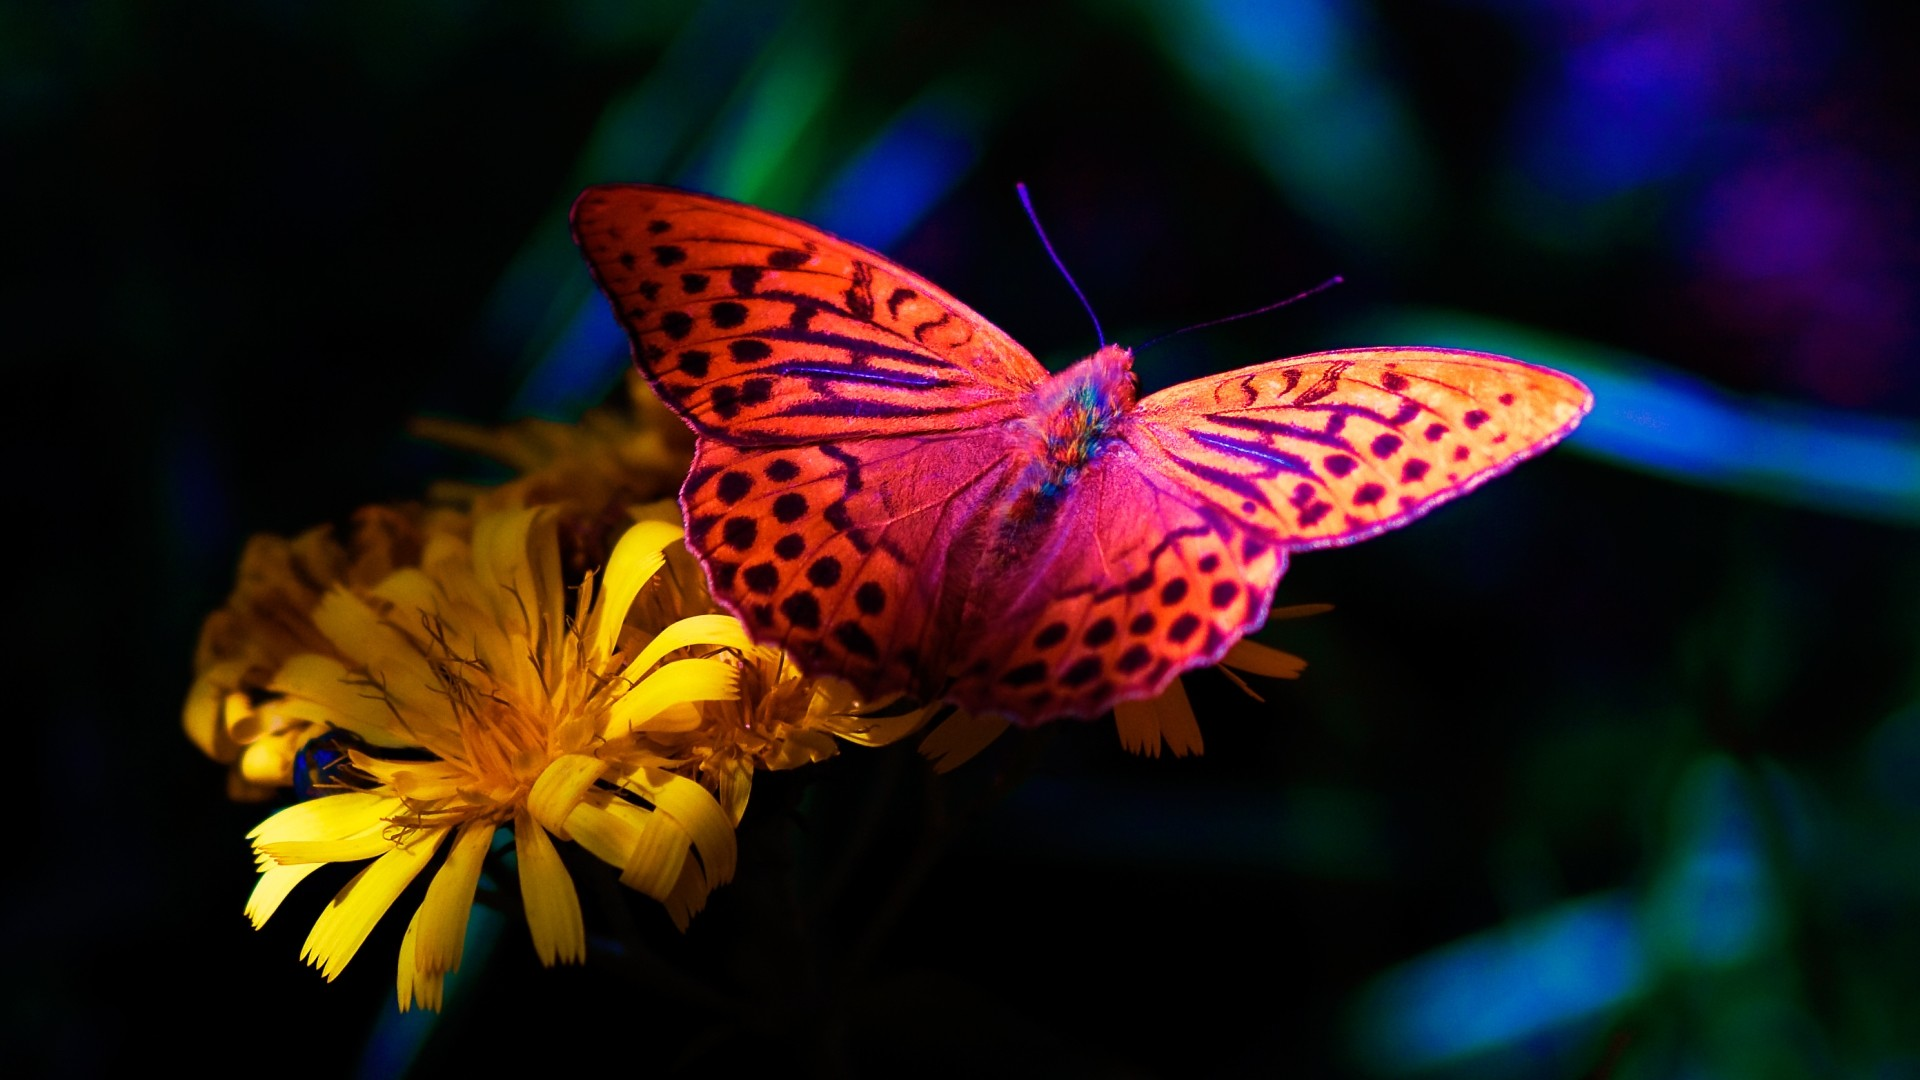 … Wallpaper Color Butterfly Fullscreen …